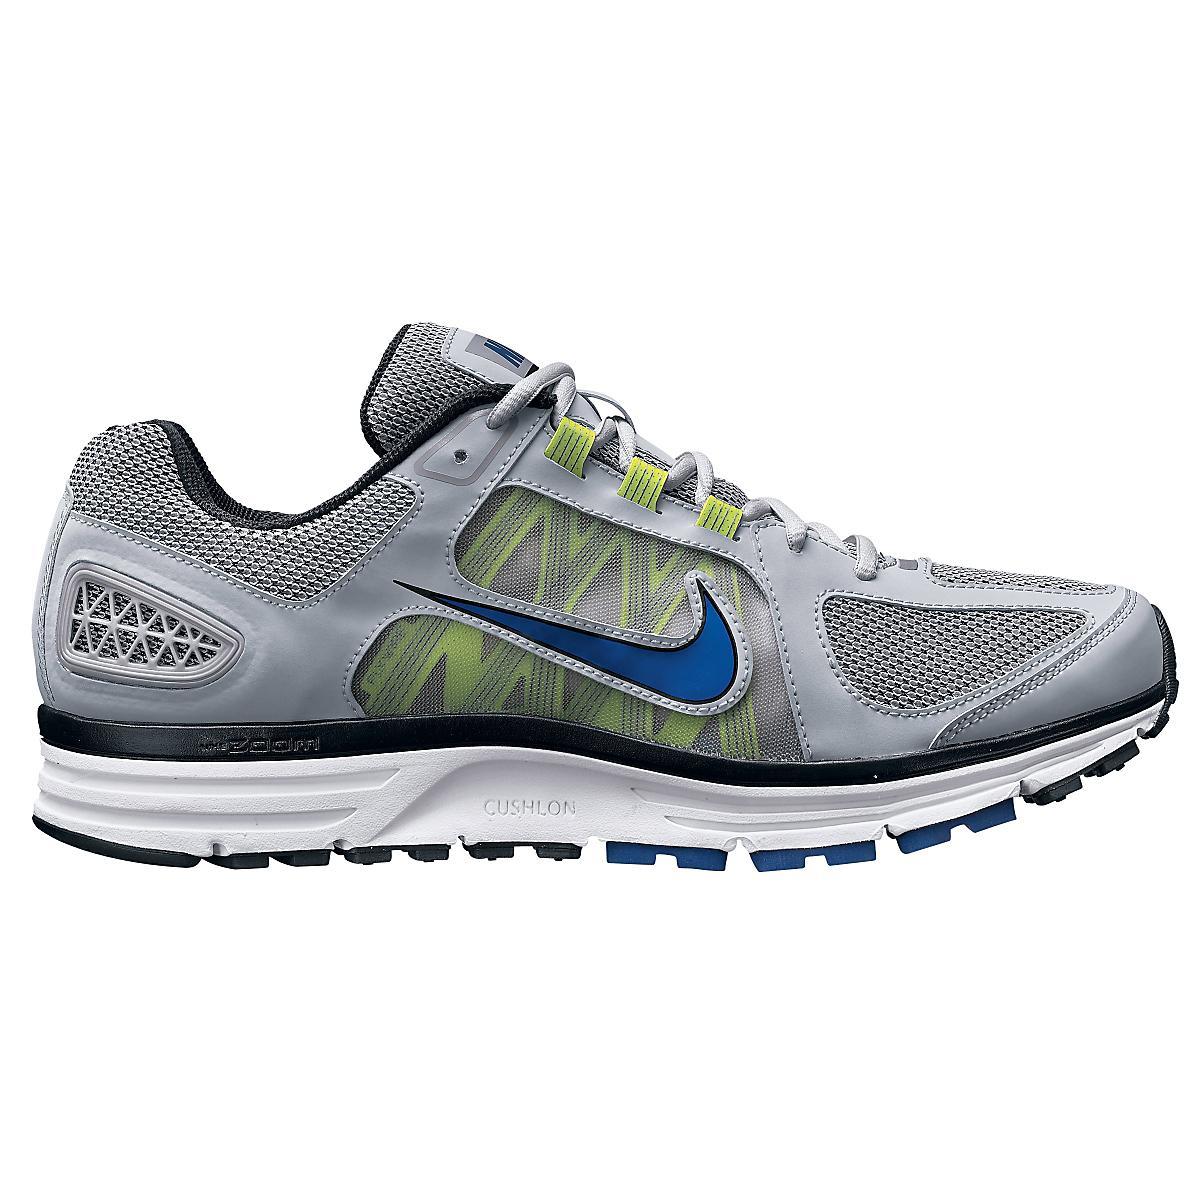 962c9121f60 Mens Nike Zoom Vomero+ 7 Running Shoe at Road Runner Sports